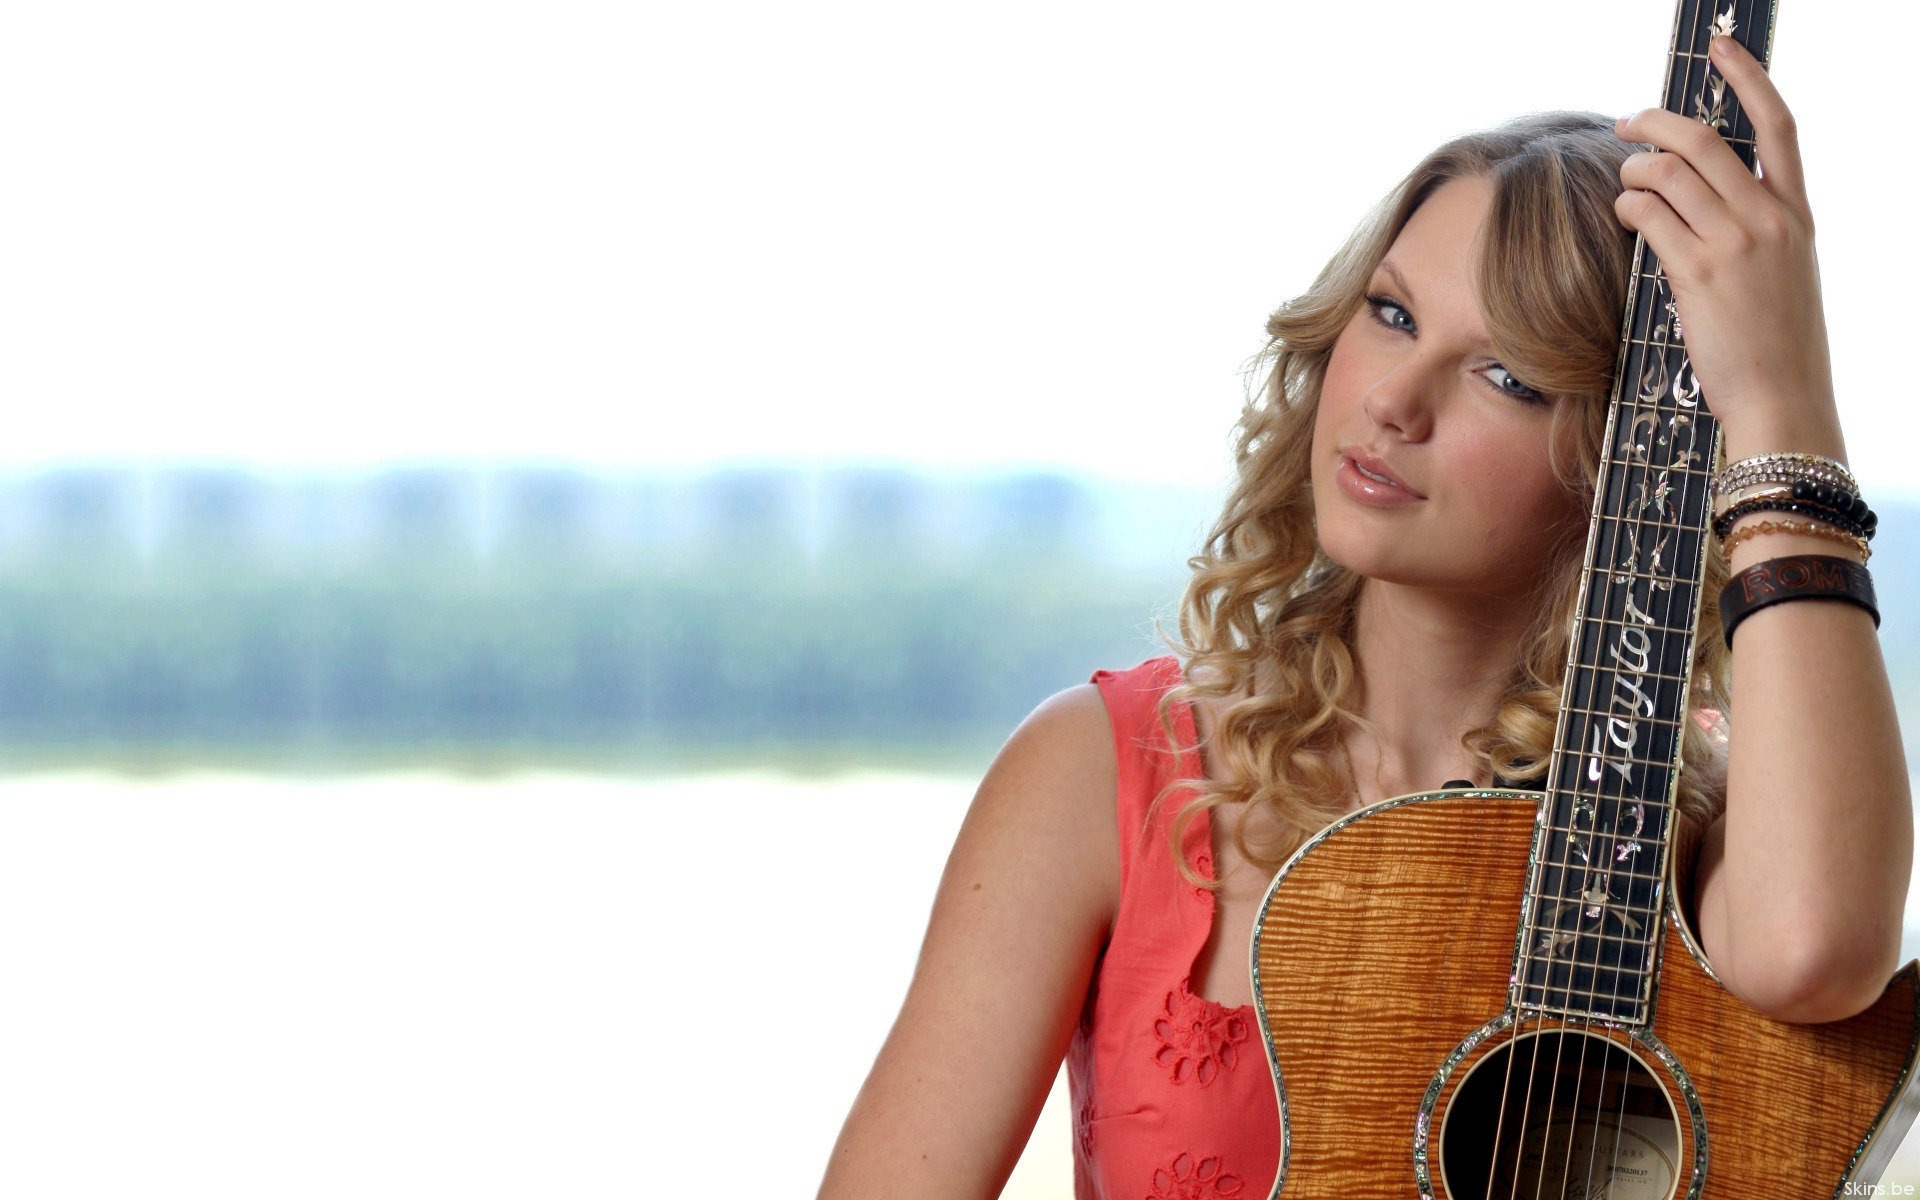 Cute Valentine Desktop Wallpaper Taylor Swift Wallpaper Hd Images Pixelstalk Net